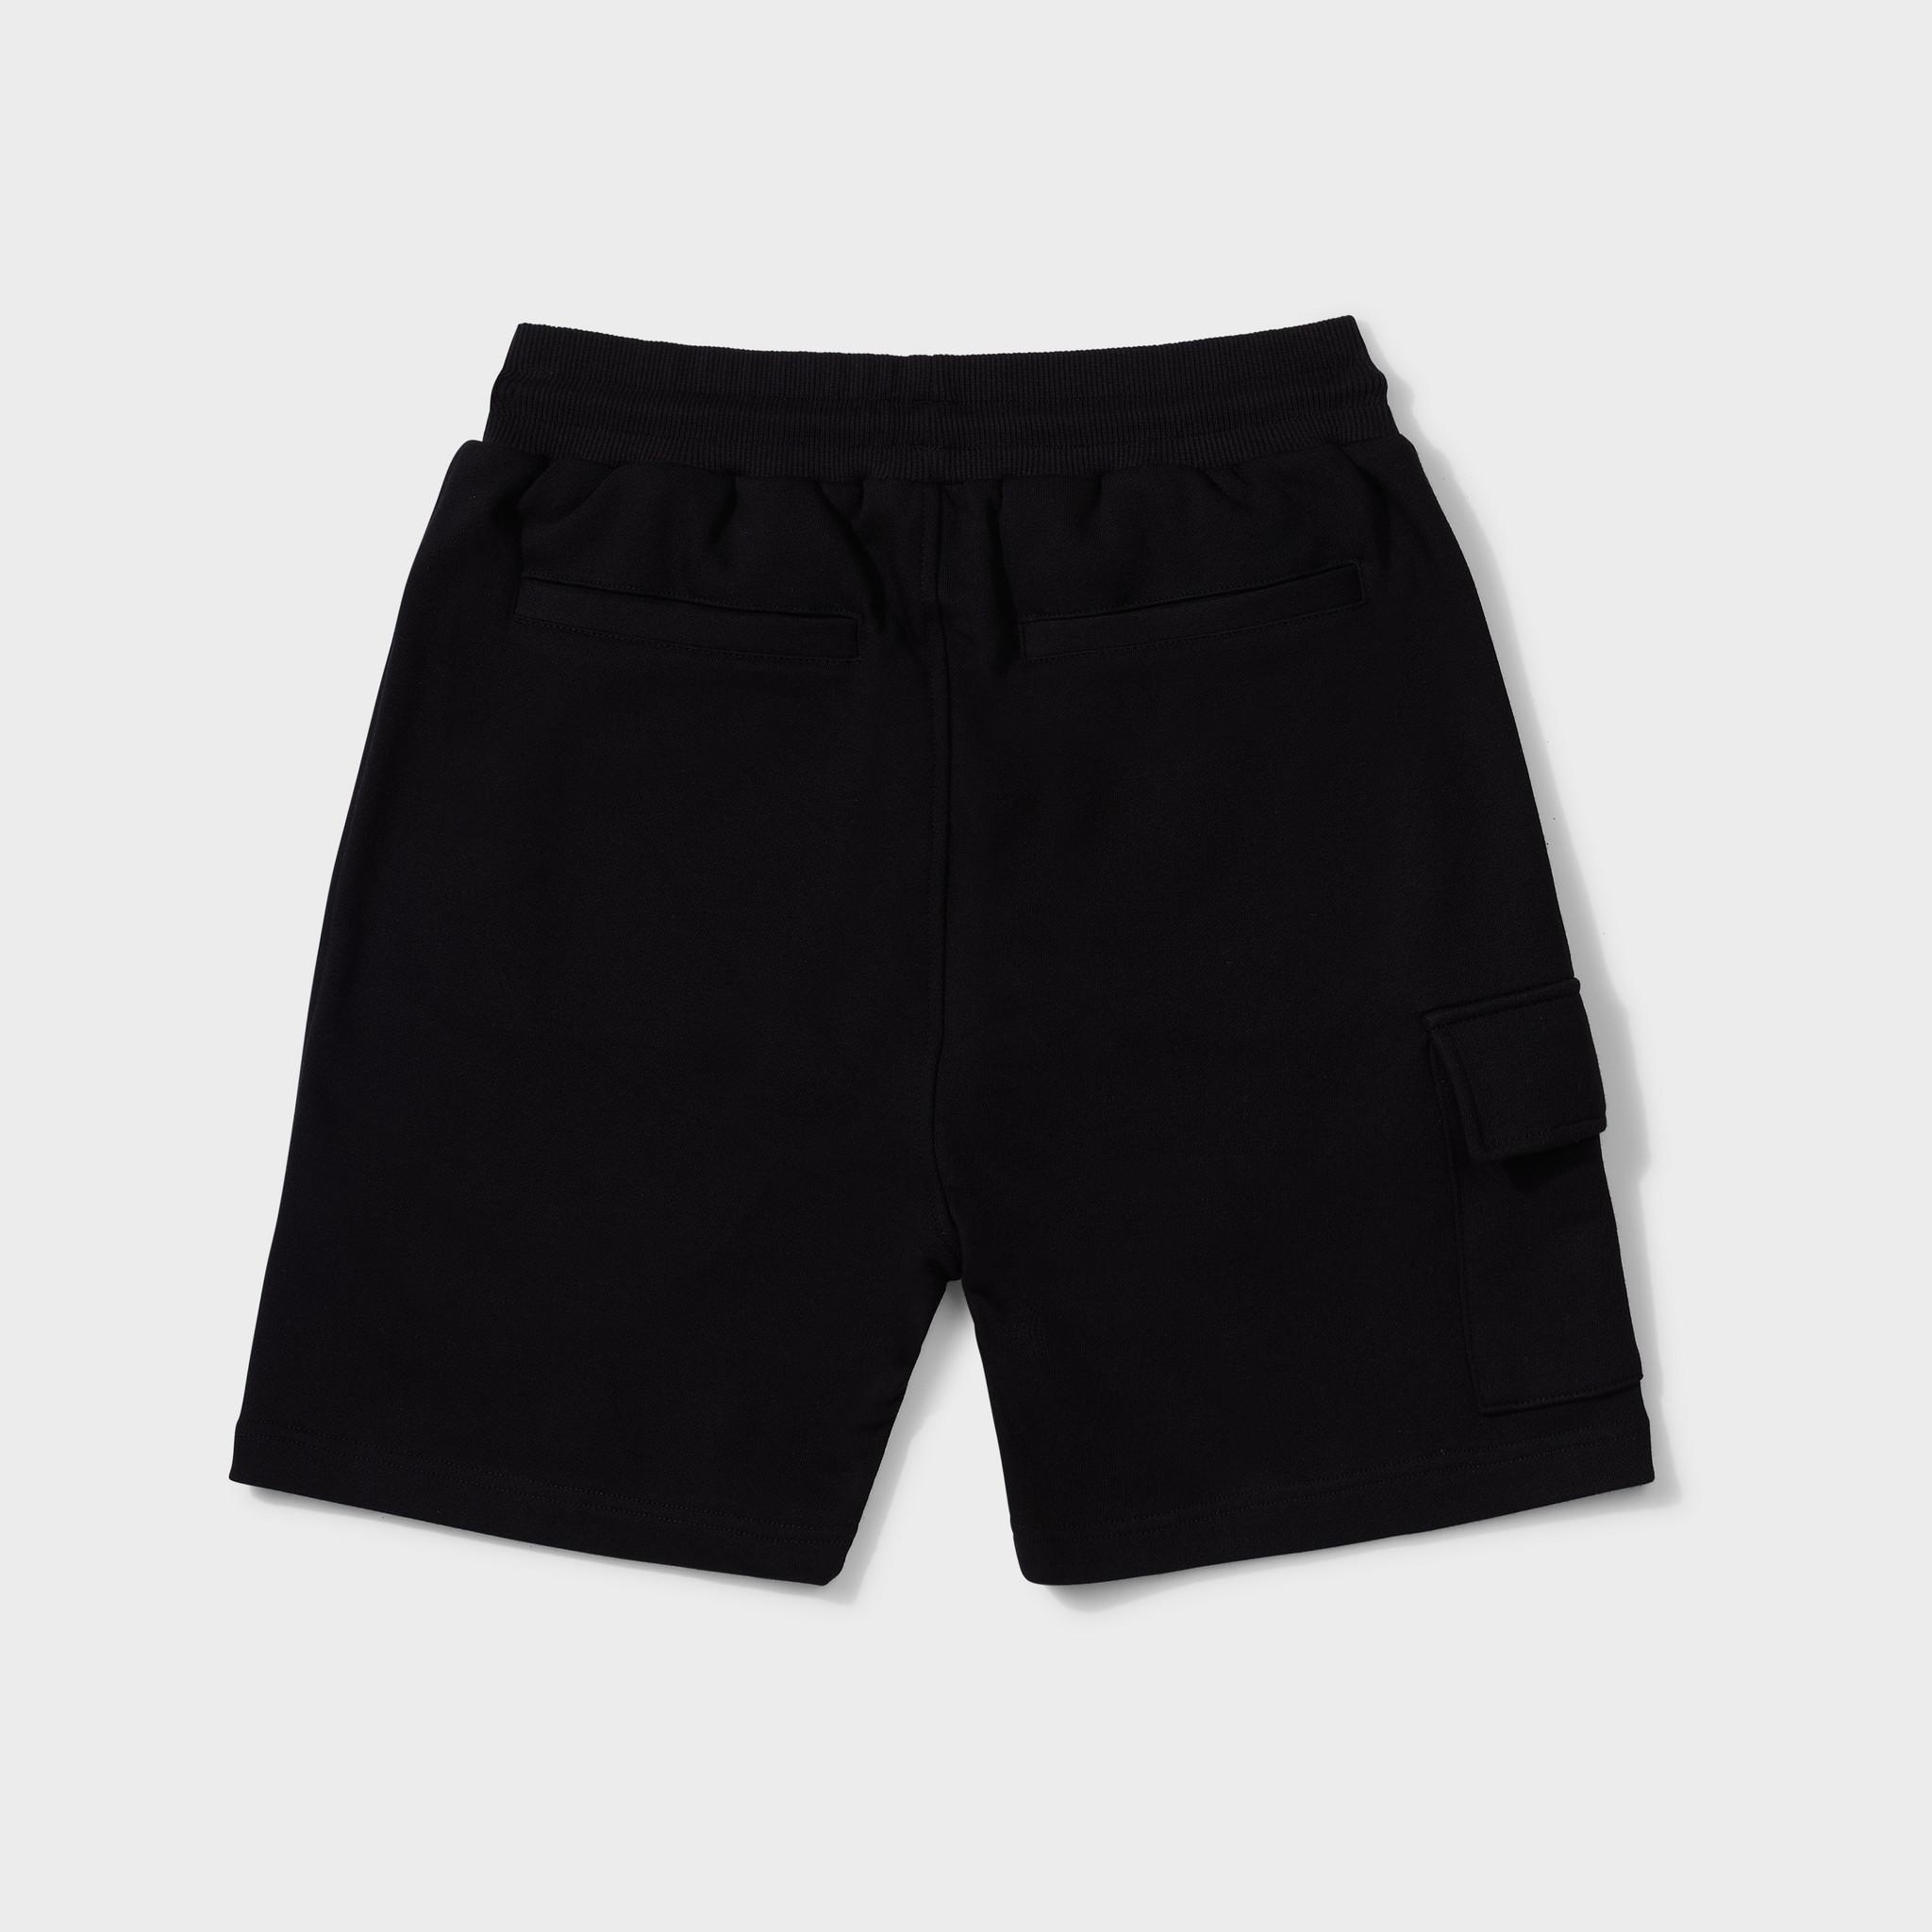 Wafi signature shorts black & red-2